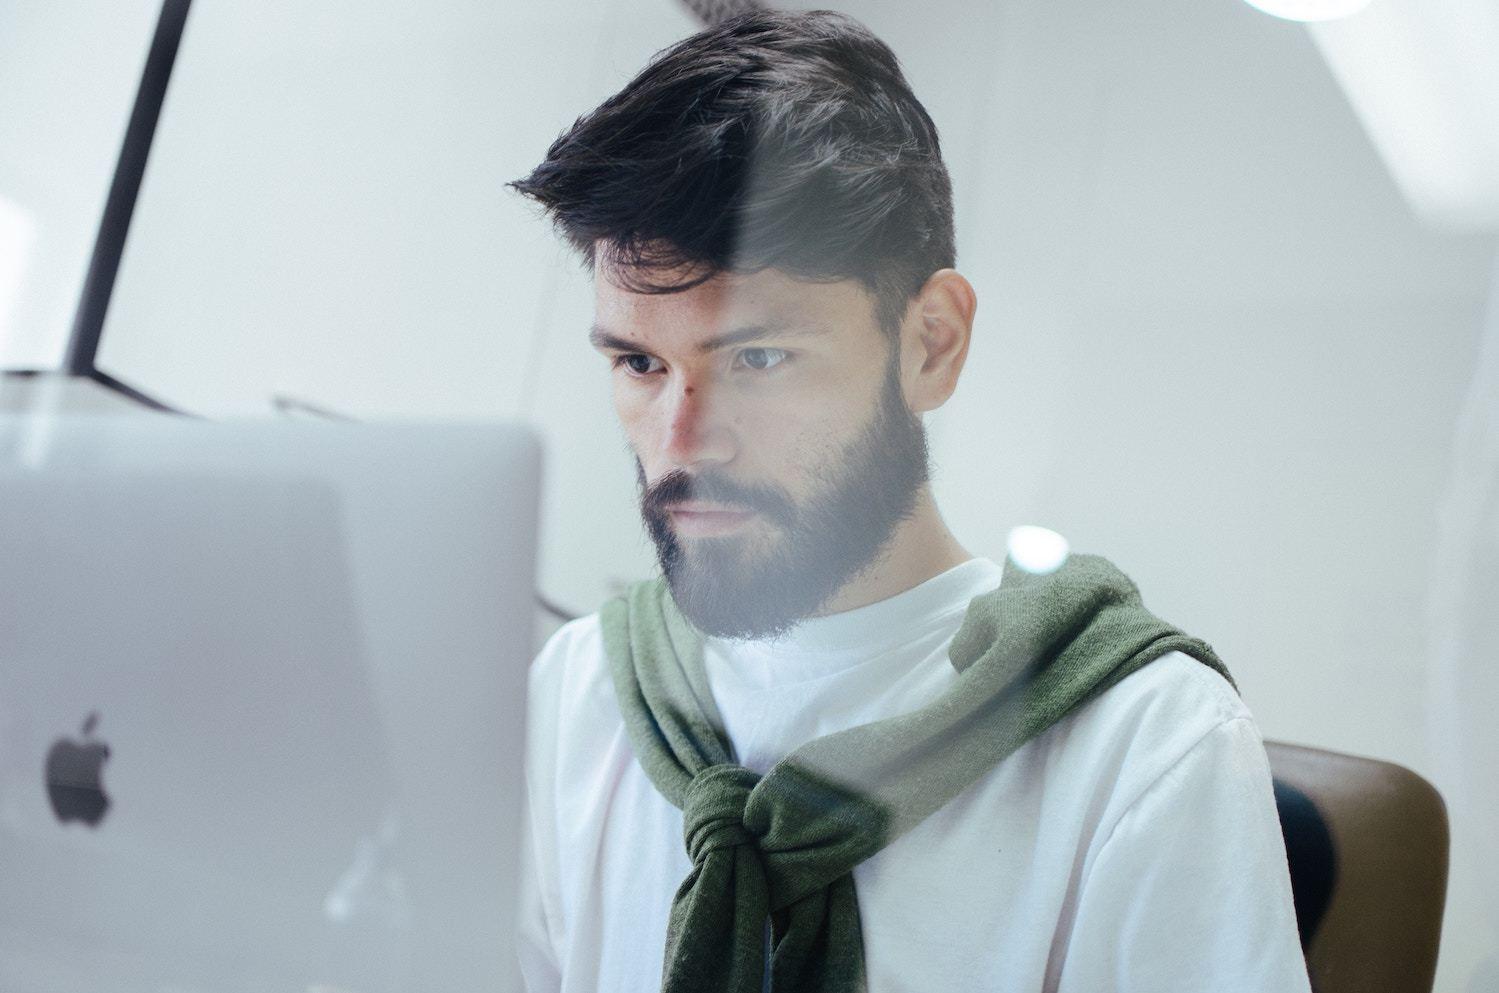 man using computer at work